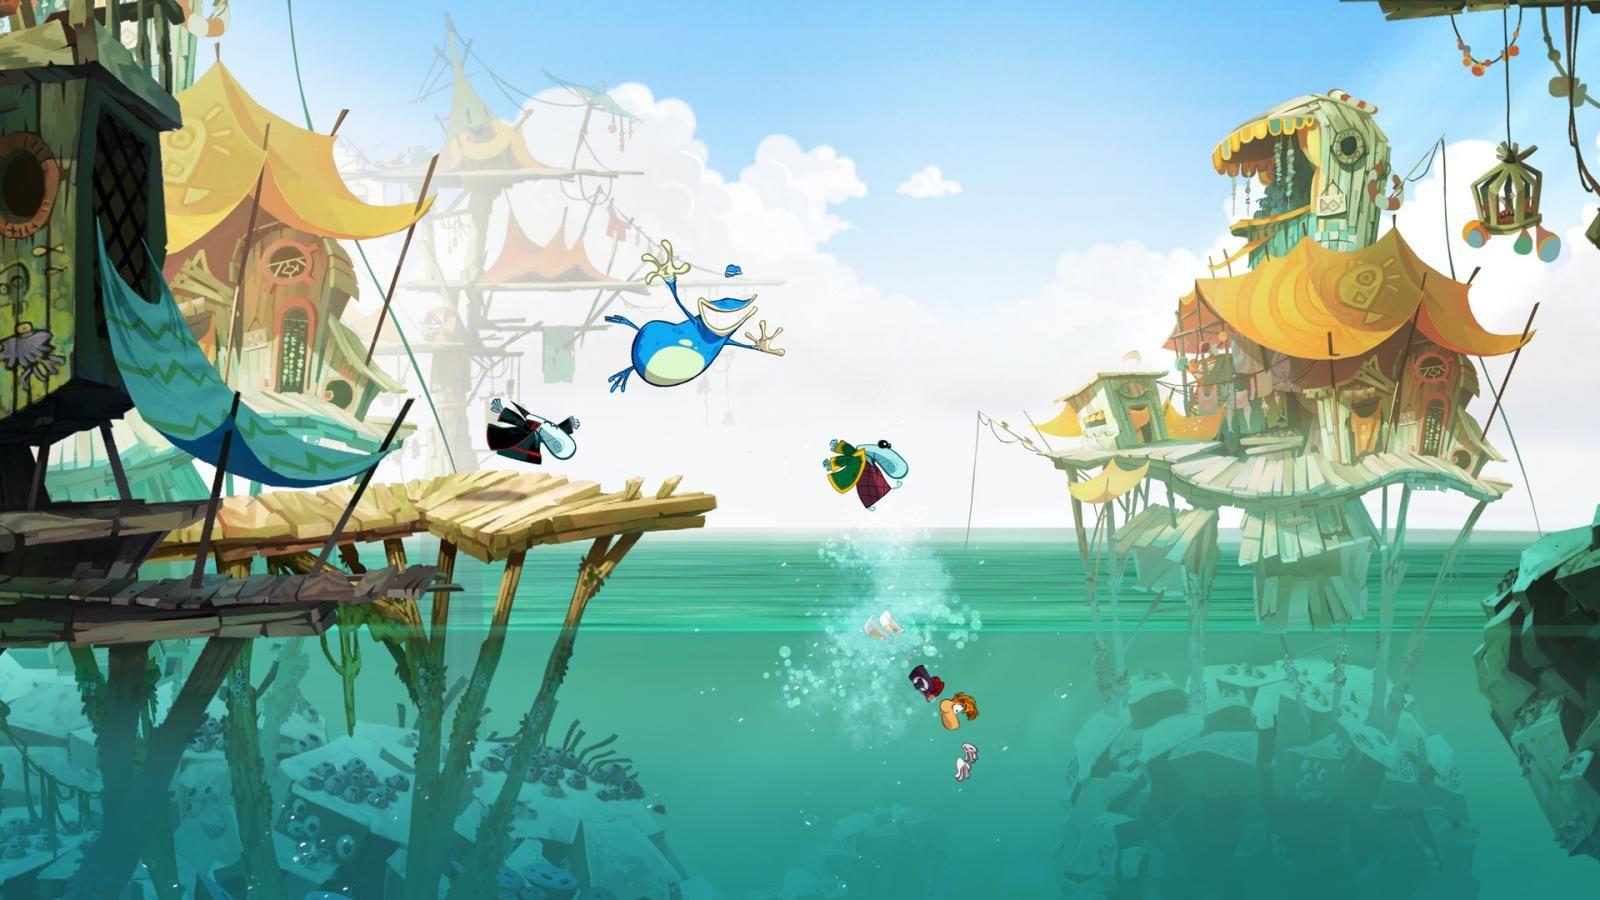 NUR ALS ZITAT Screenshot Rayman Legends